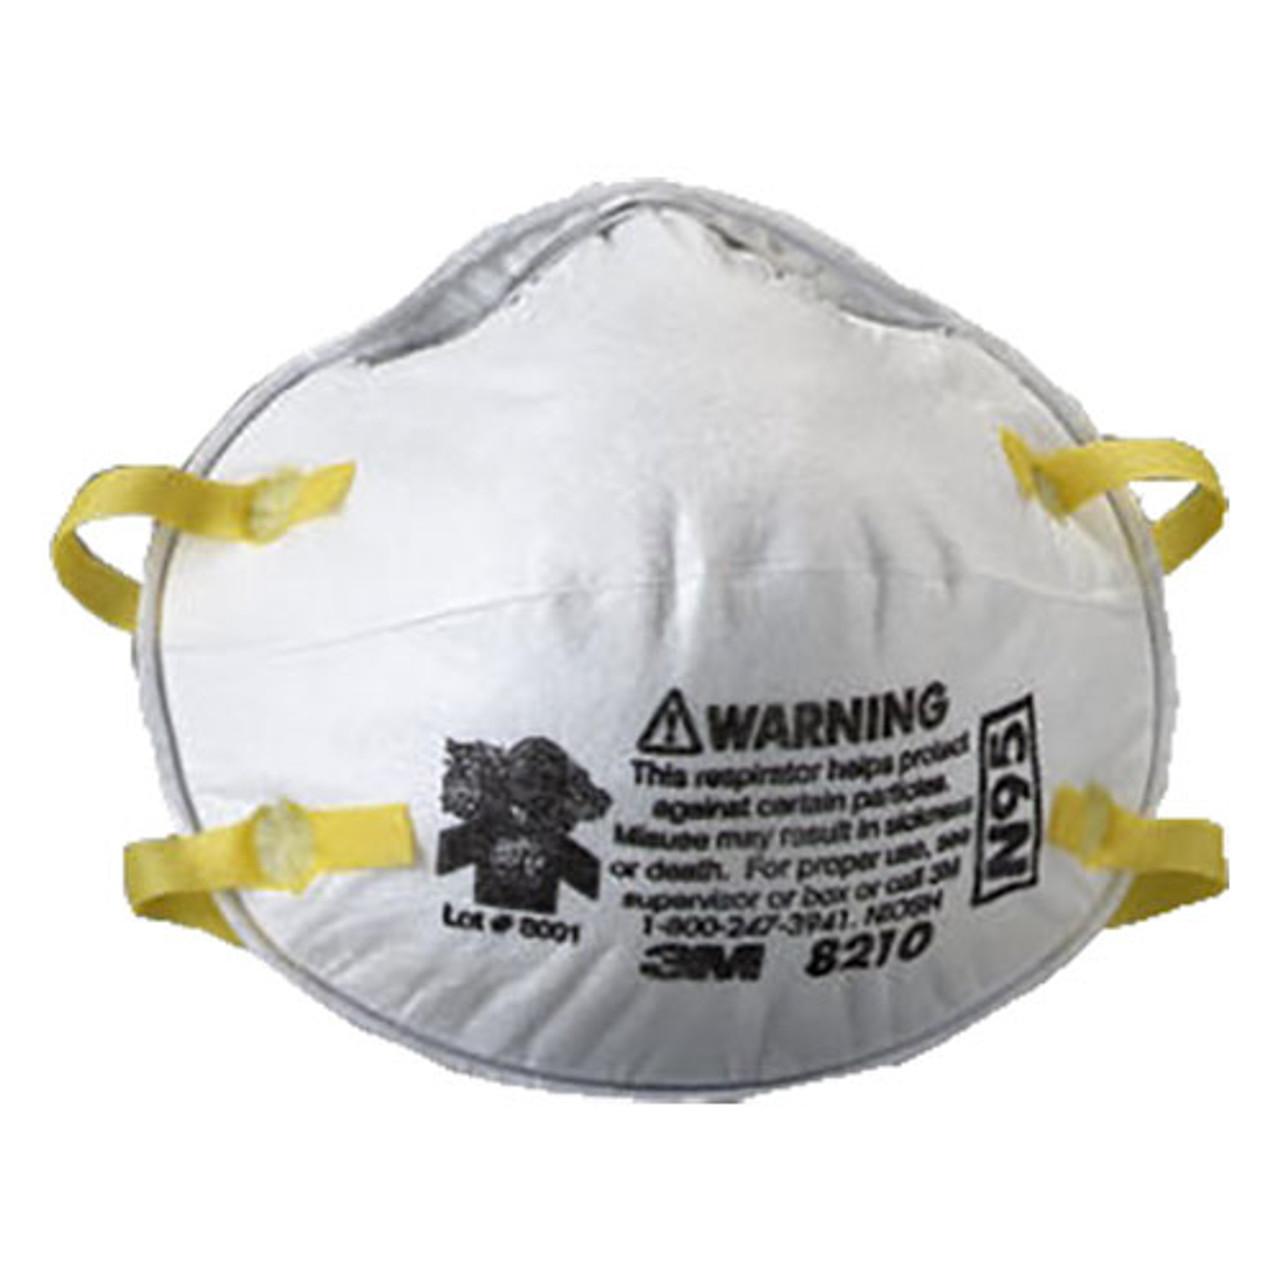 3m N95 8210 Rp6810 Disp Ea Particulate bx Respirator 20